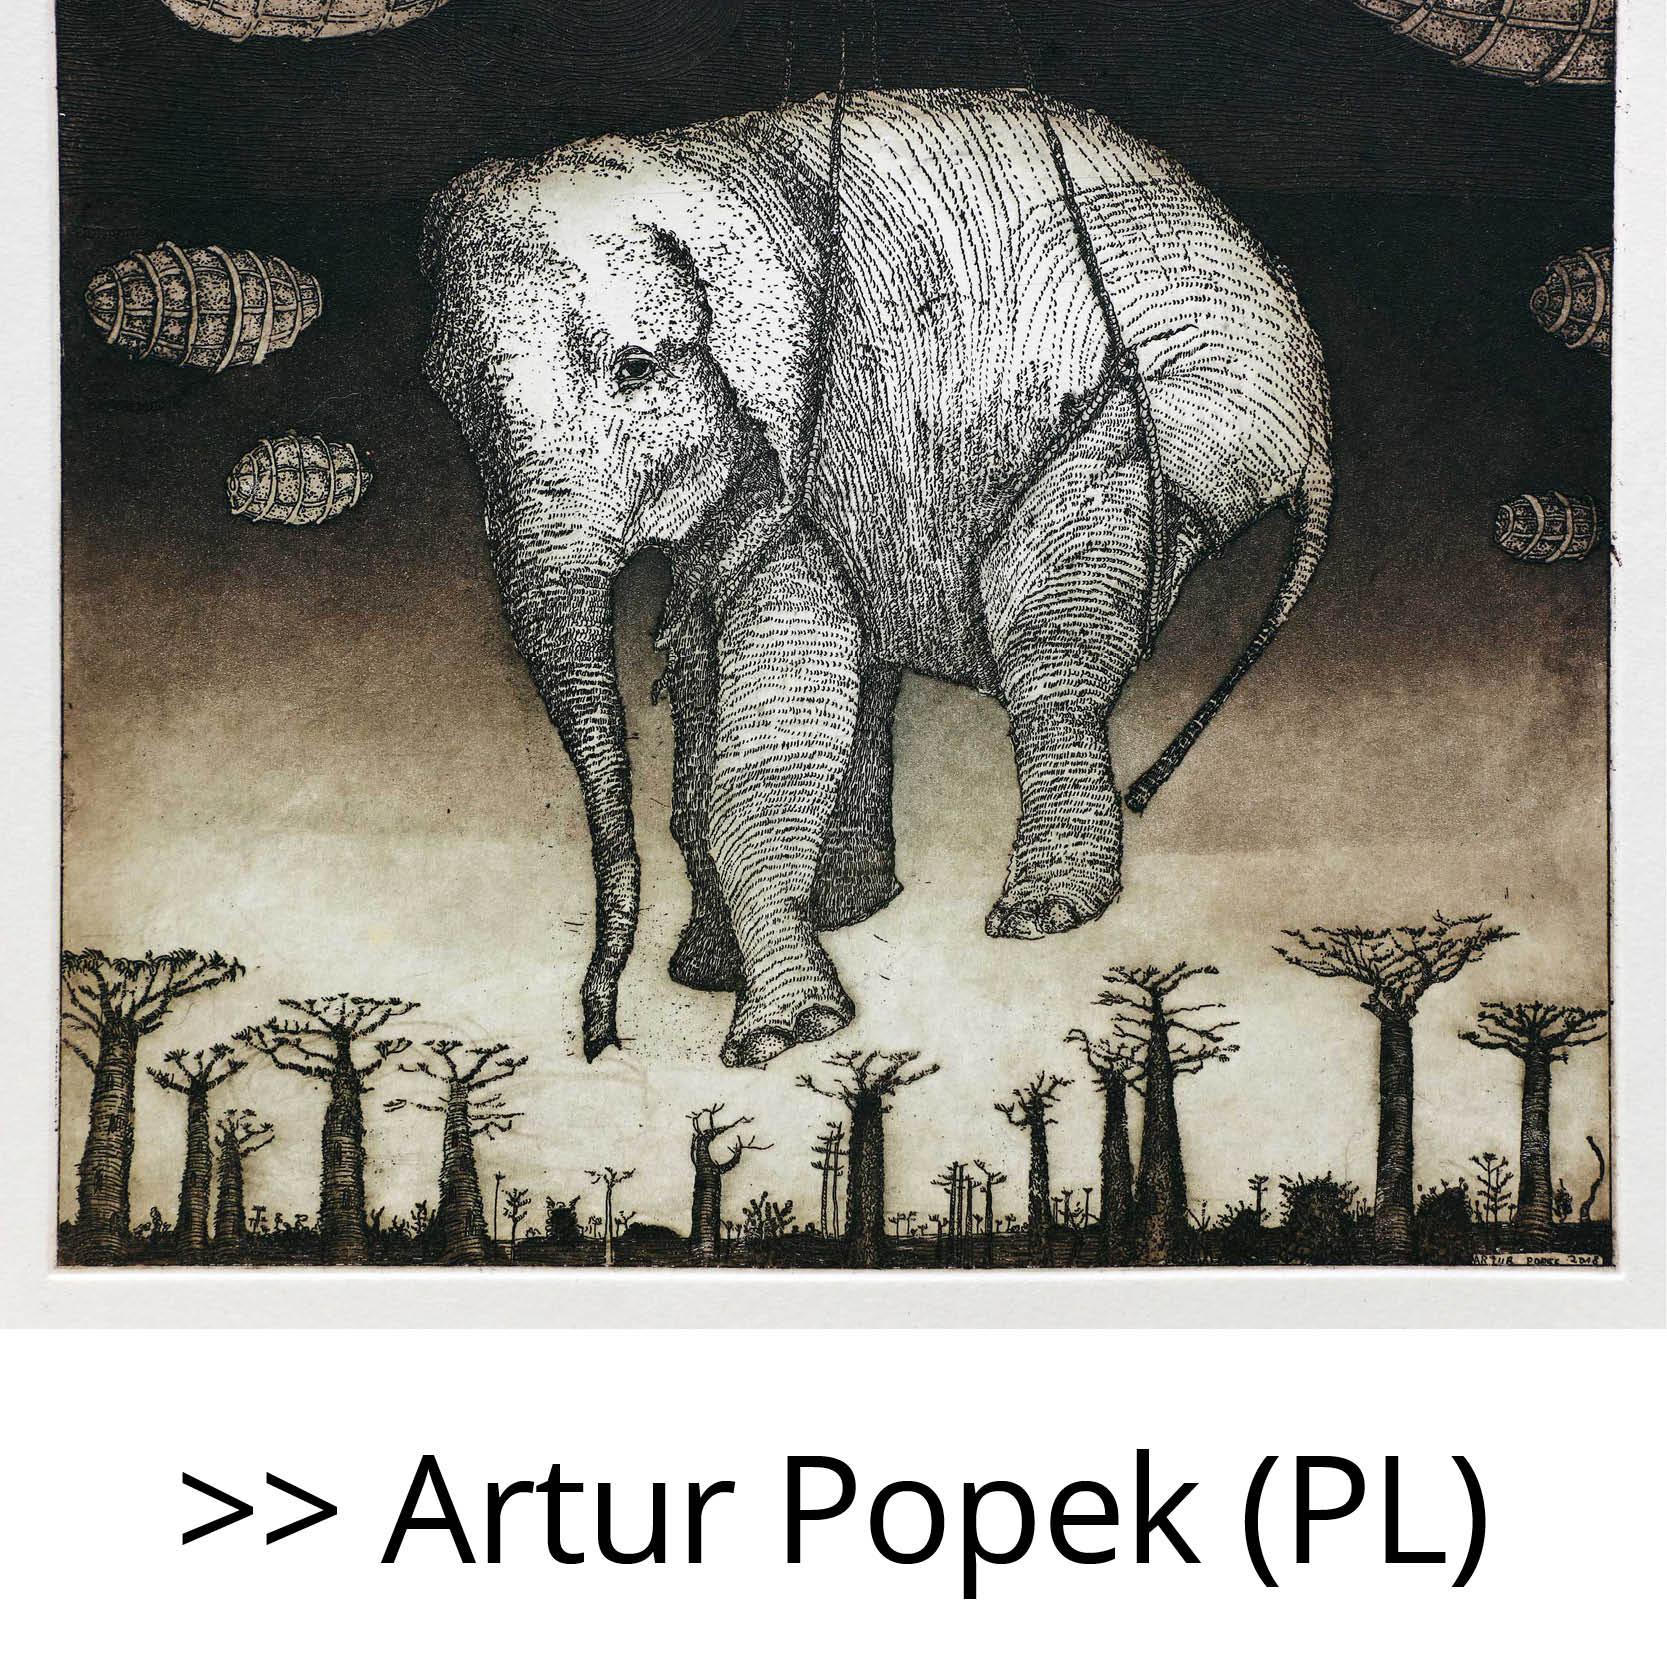 Artur_Popek_(PL)